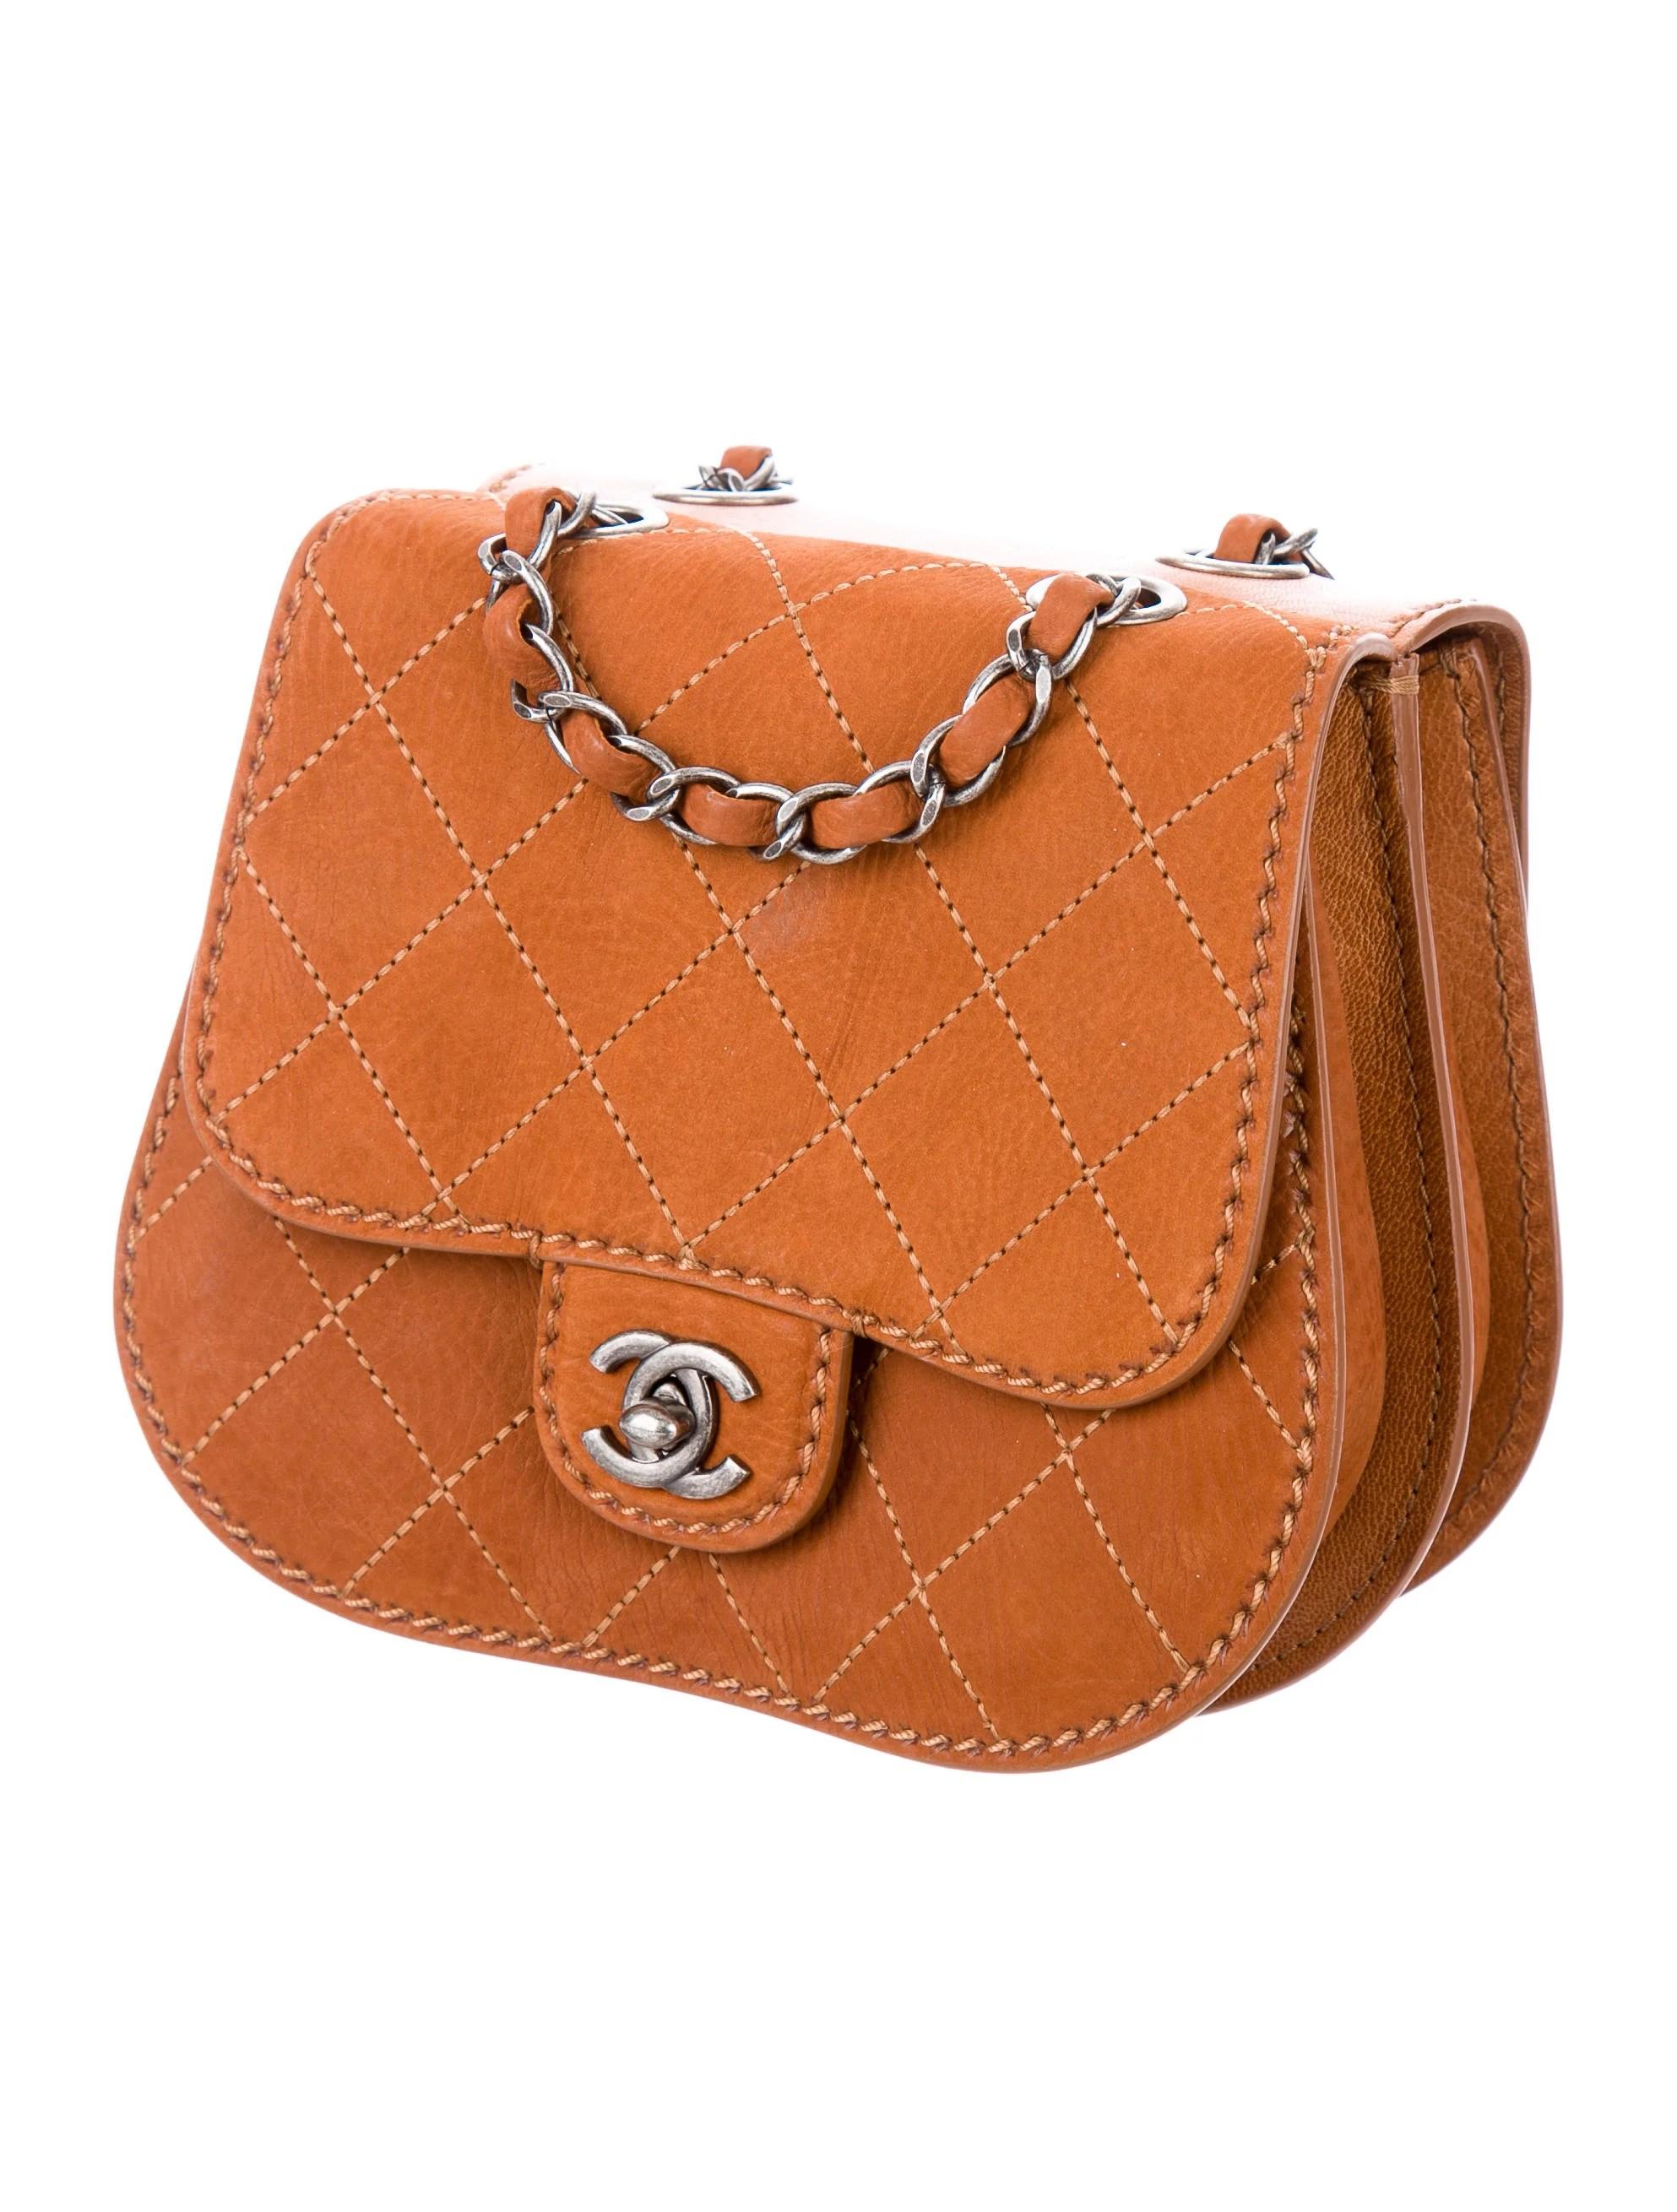 Chanel Coco Twin Small Flap Bag w/ Tags - Handbags ...